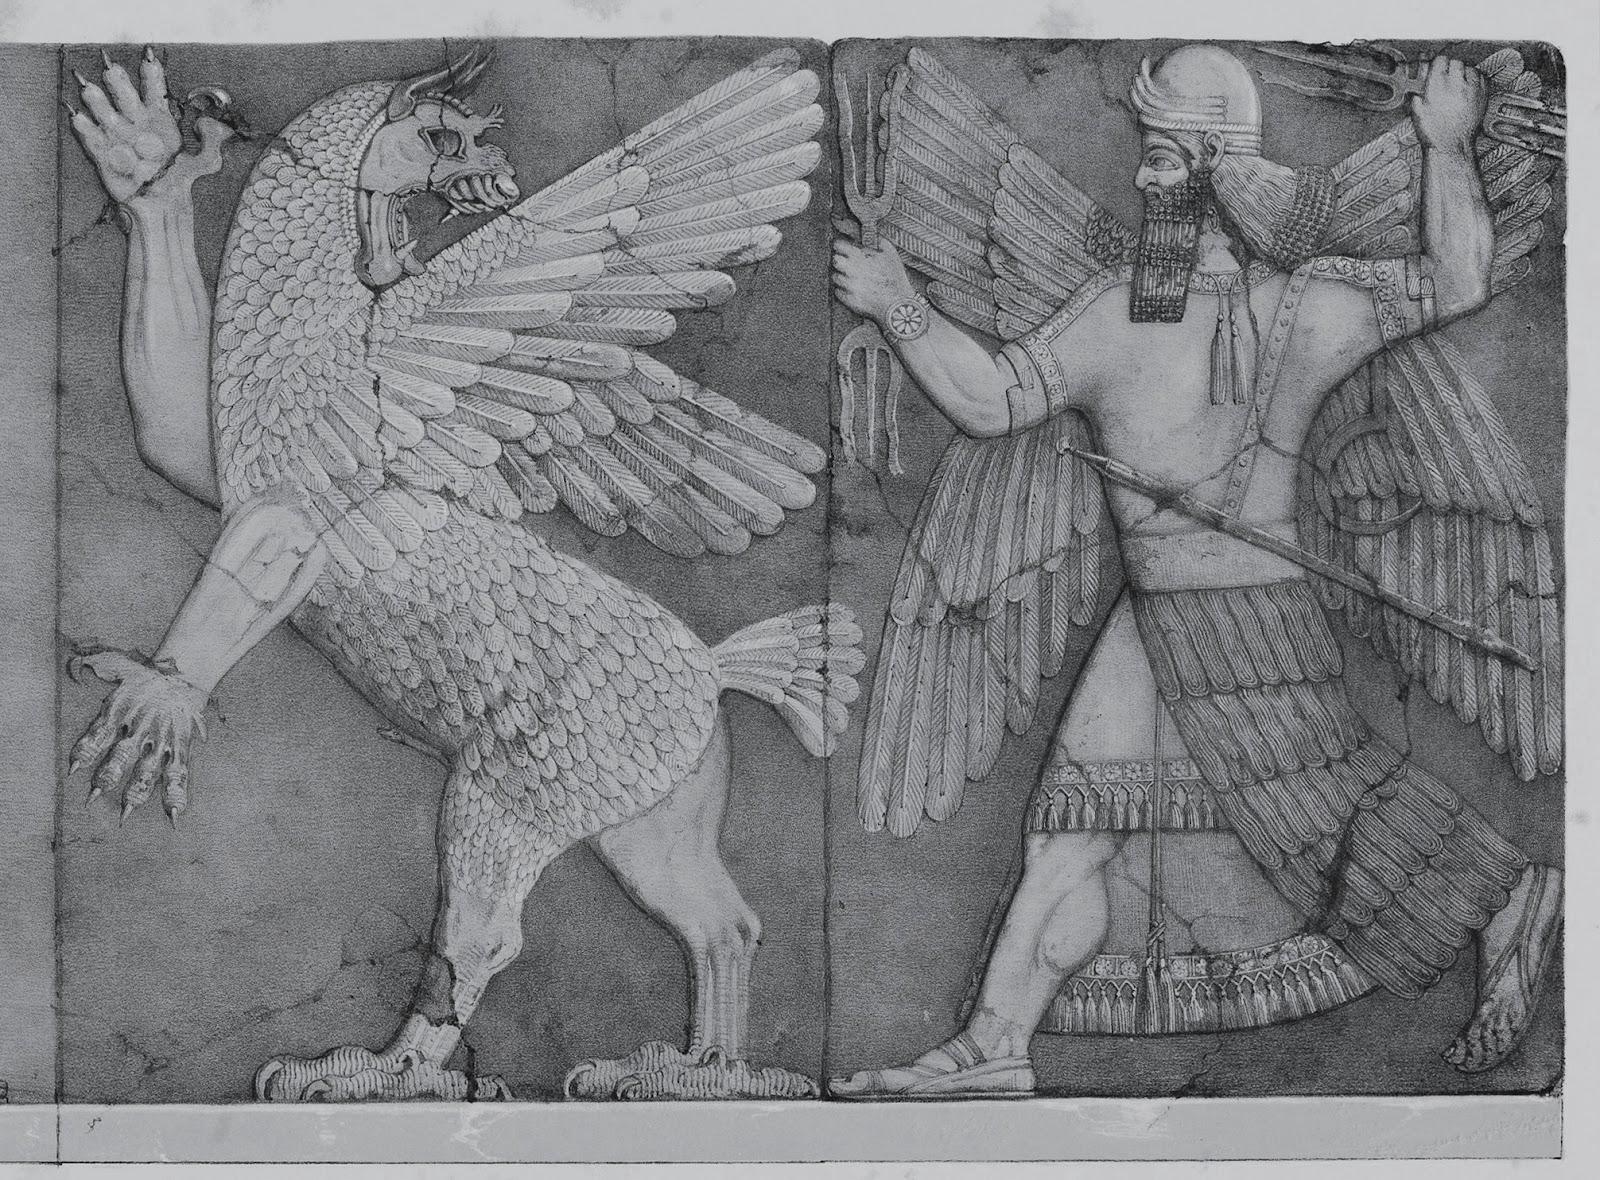 Marduk Tiamat